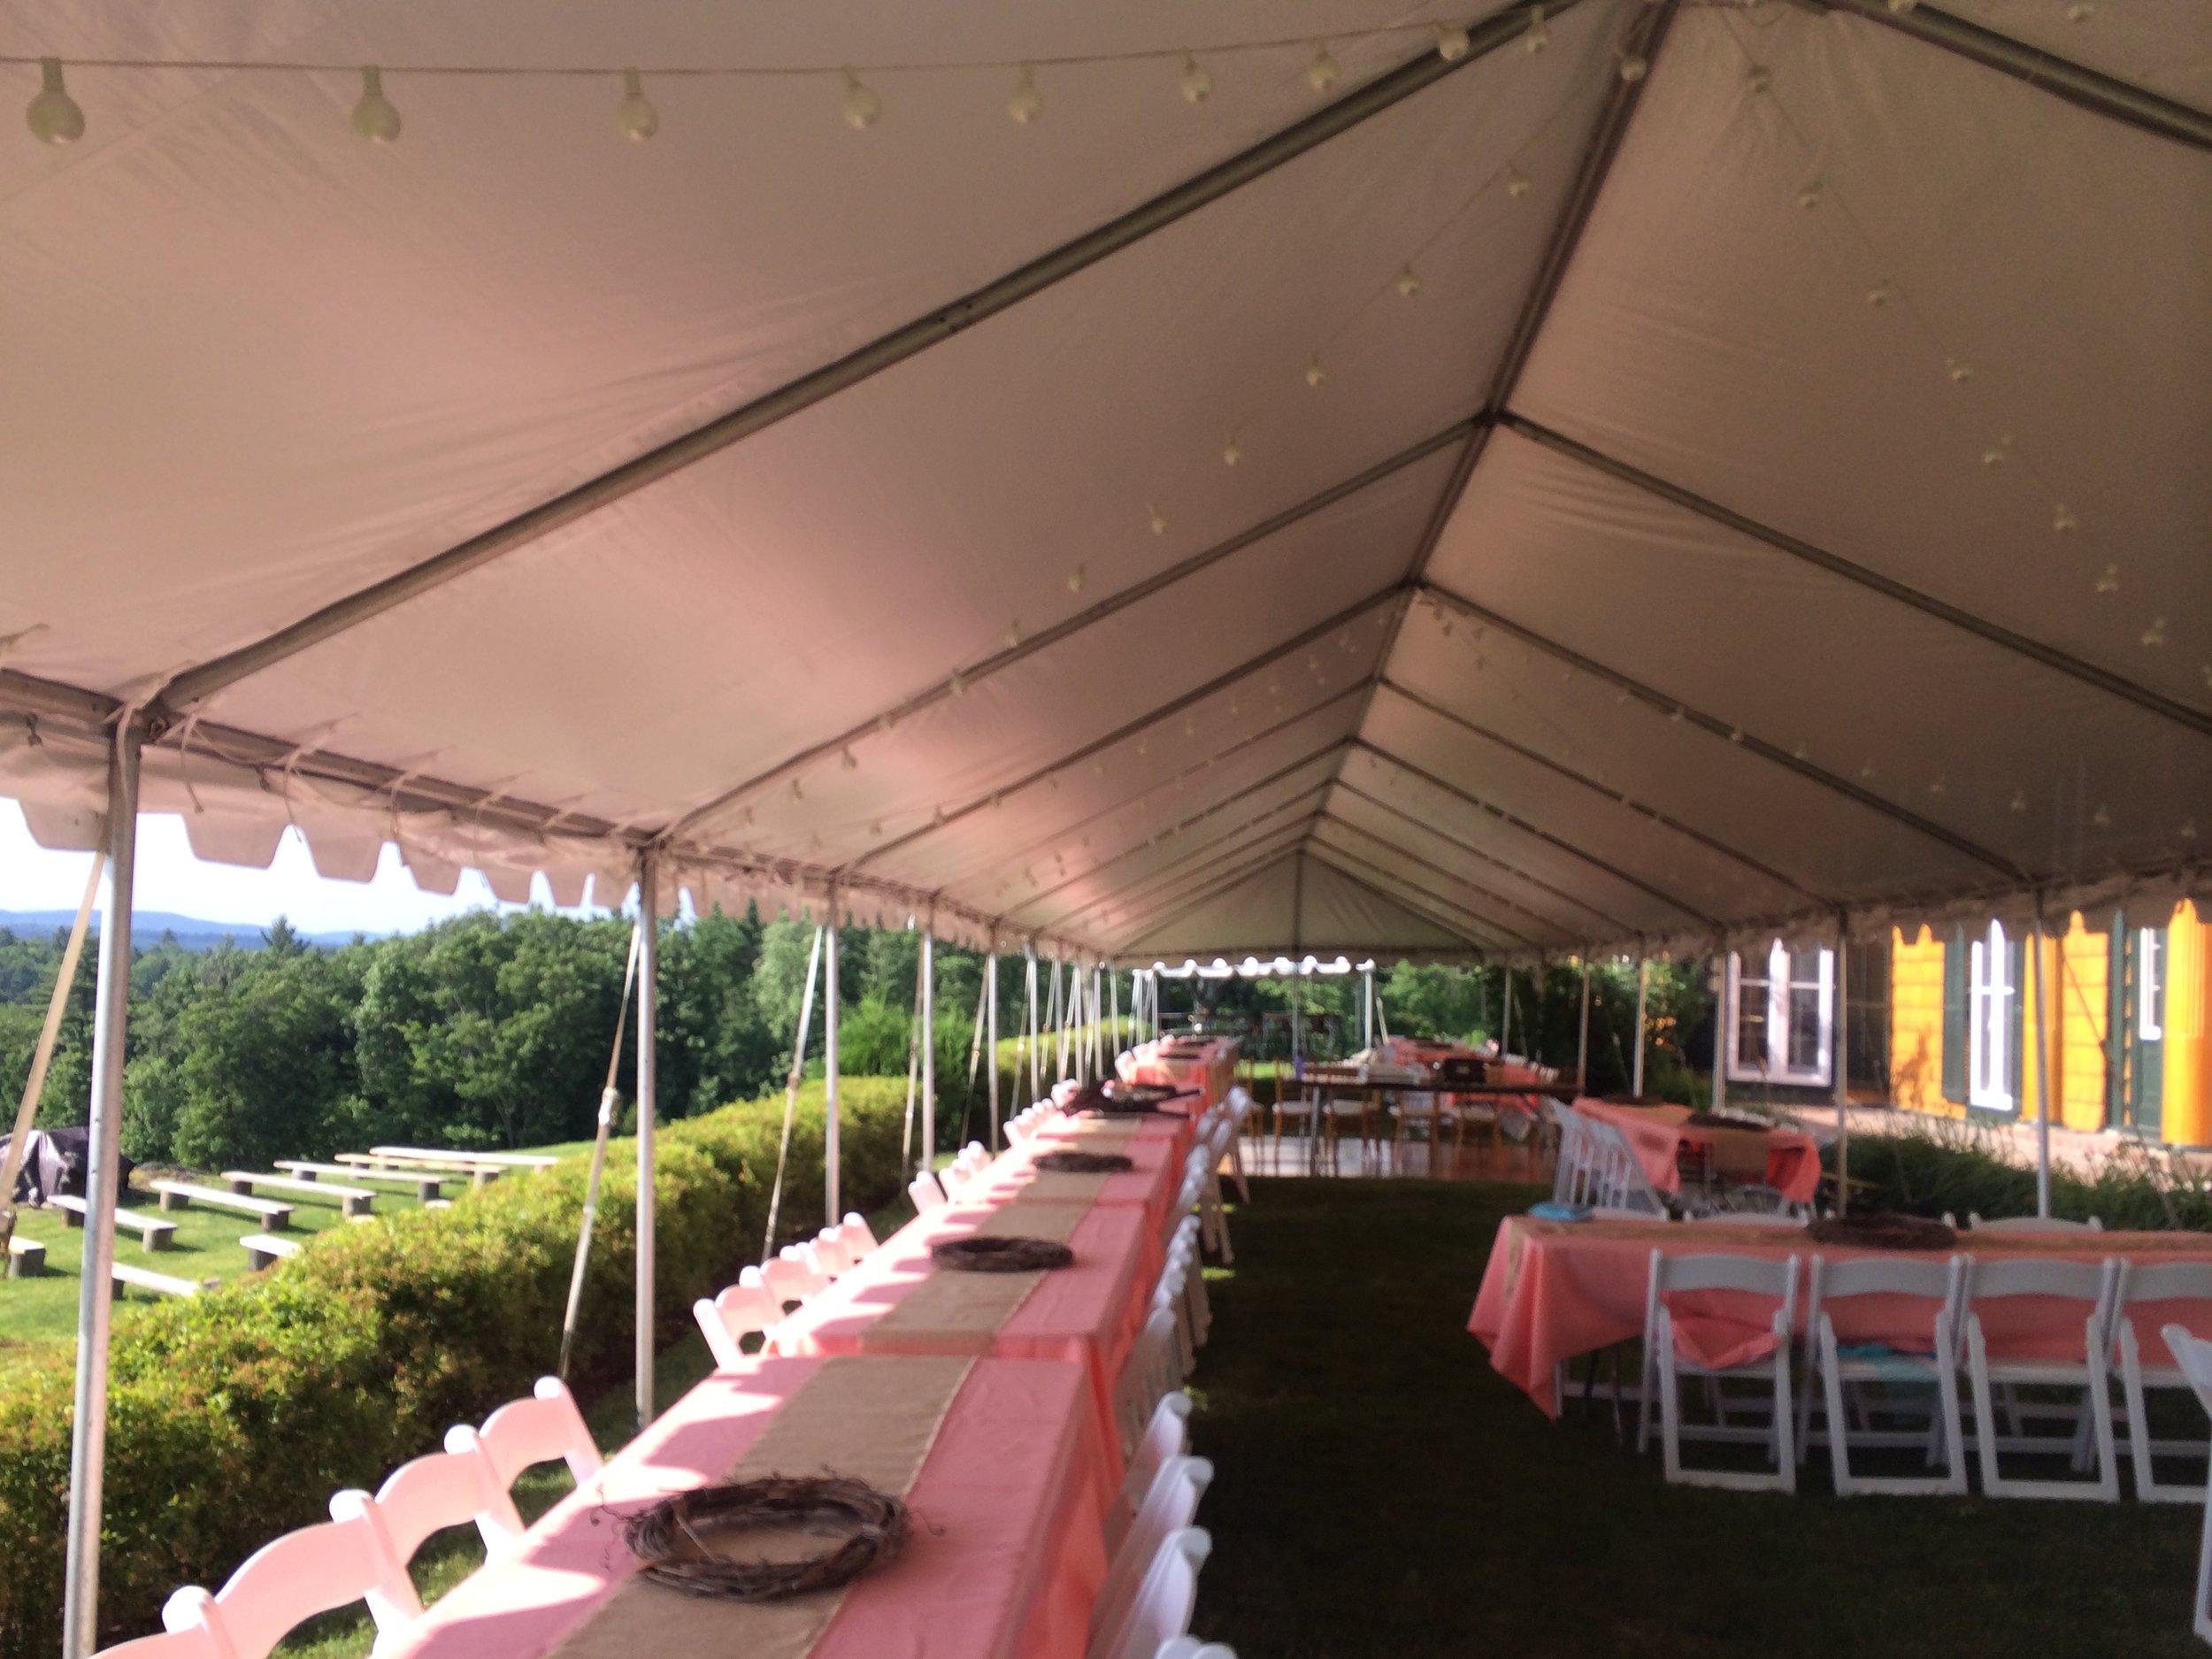 20 wide frame tent interior